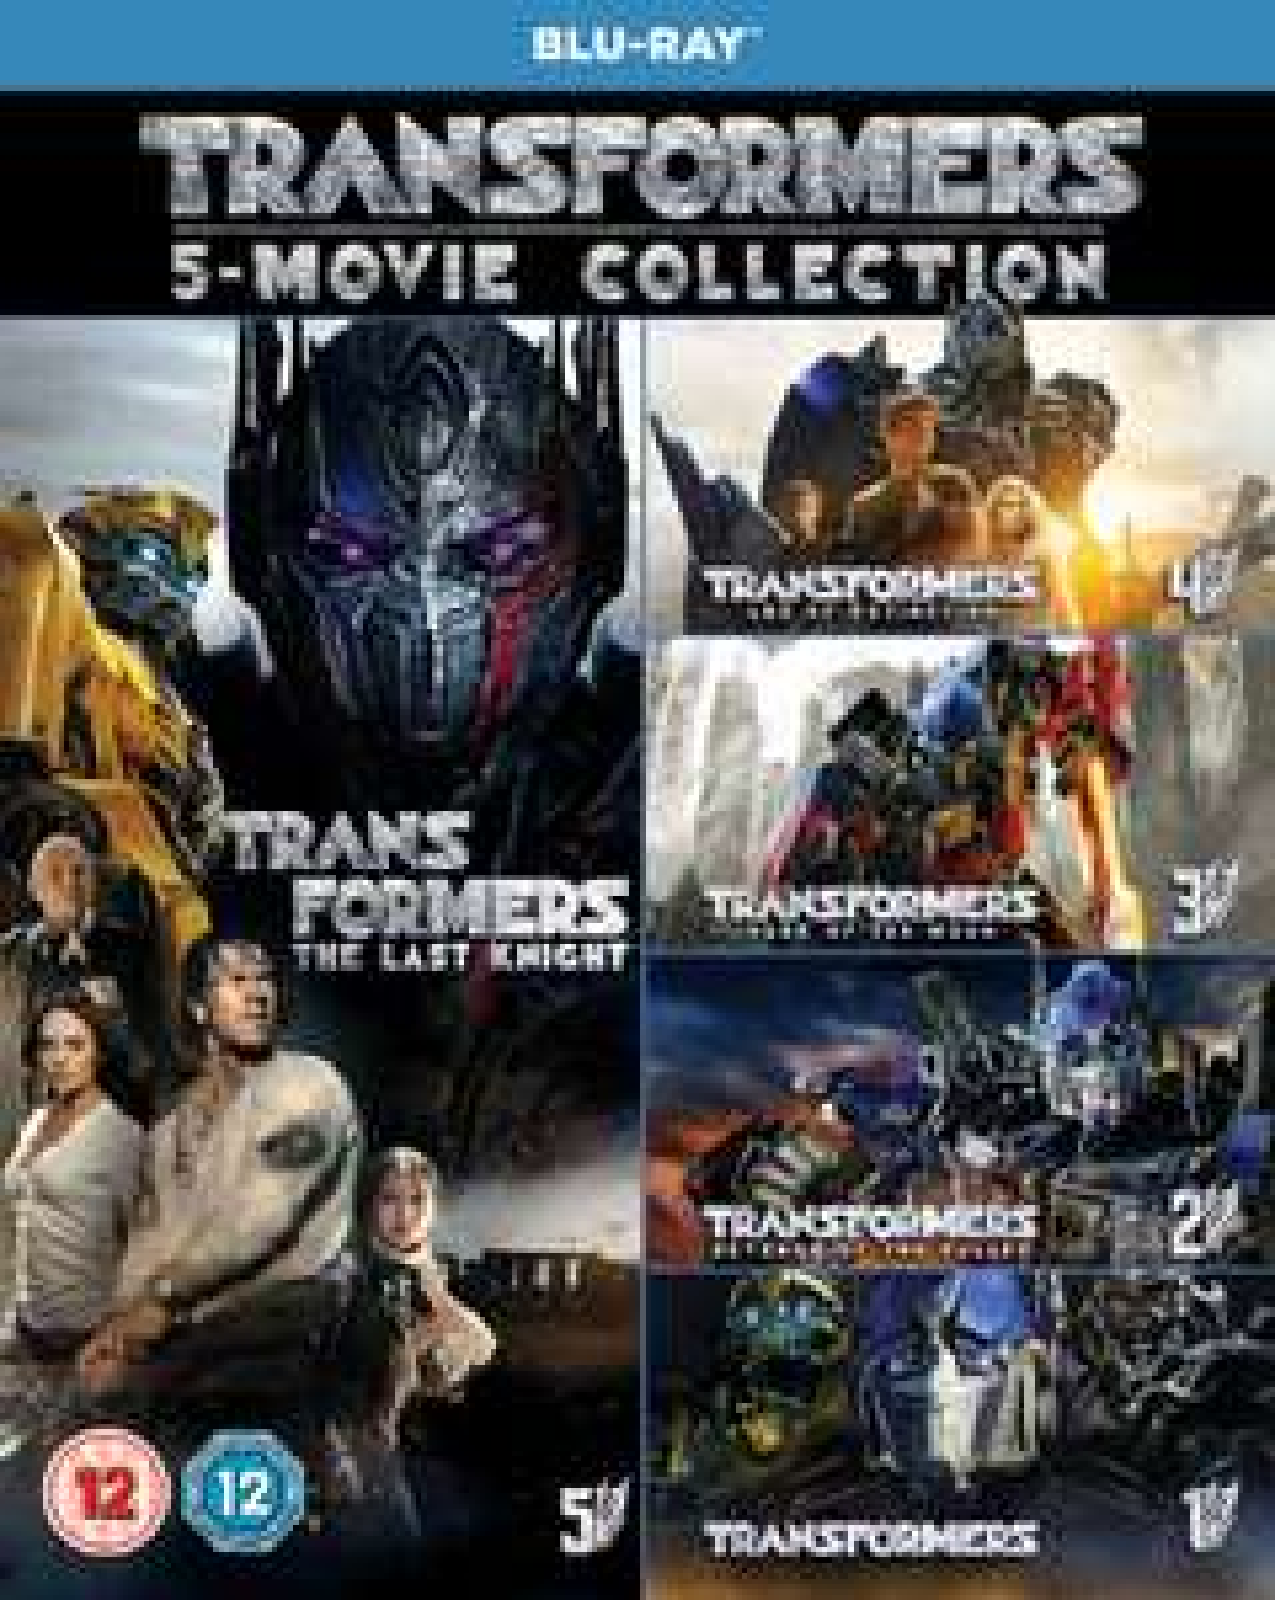 TRANSFORMERS: 5-Movie Collection + Bonus Disc Blu-Ray Boxset £13.79 (Prime) / £16.78 (non Prime) @ Amazon